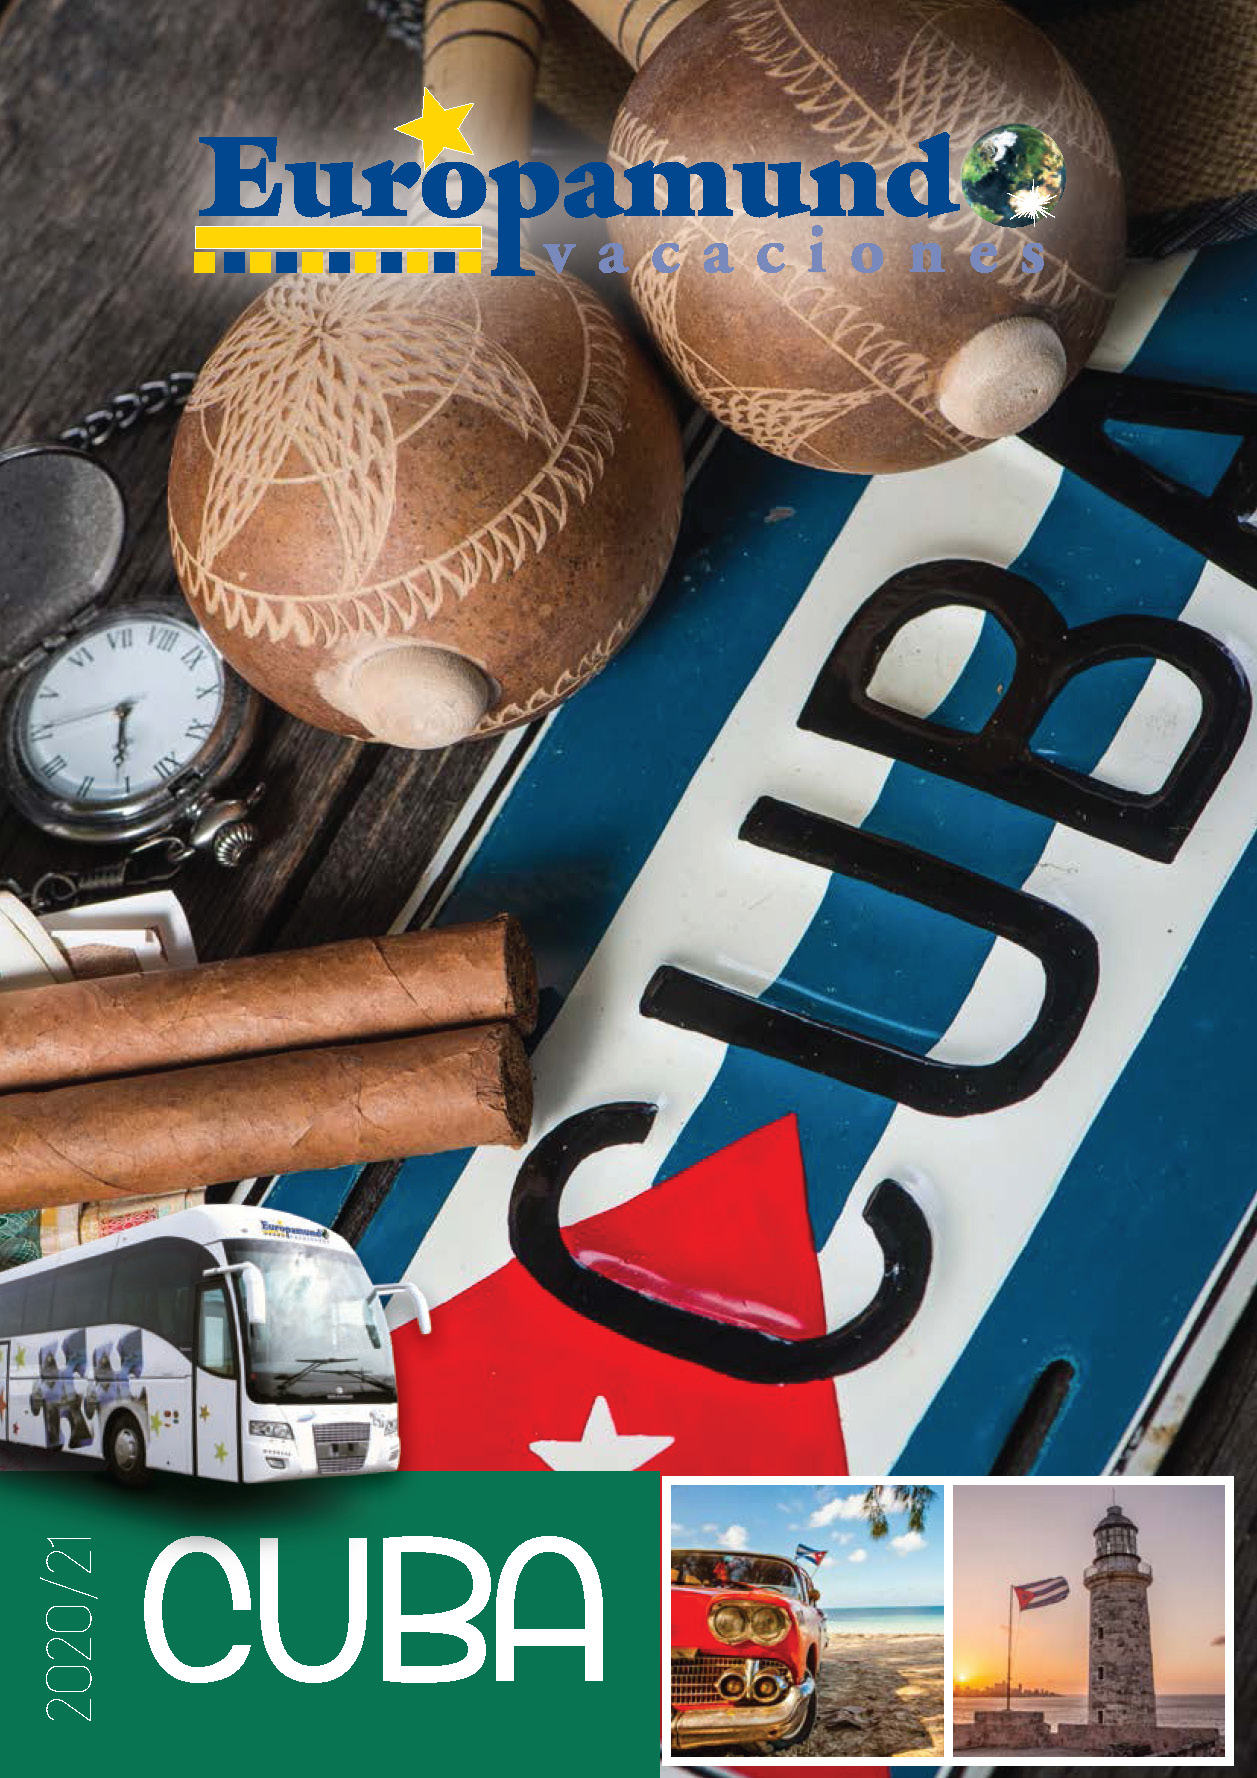 Catalogo Europamundo Vacaciones Cuba 2020-2021